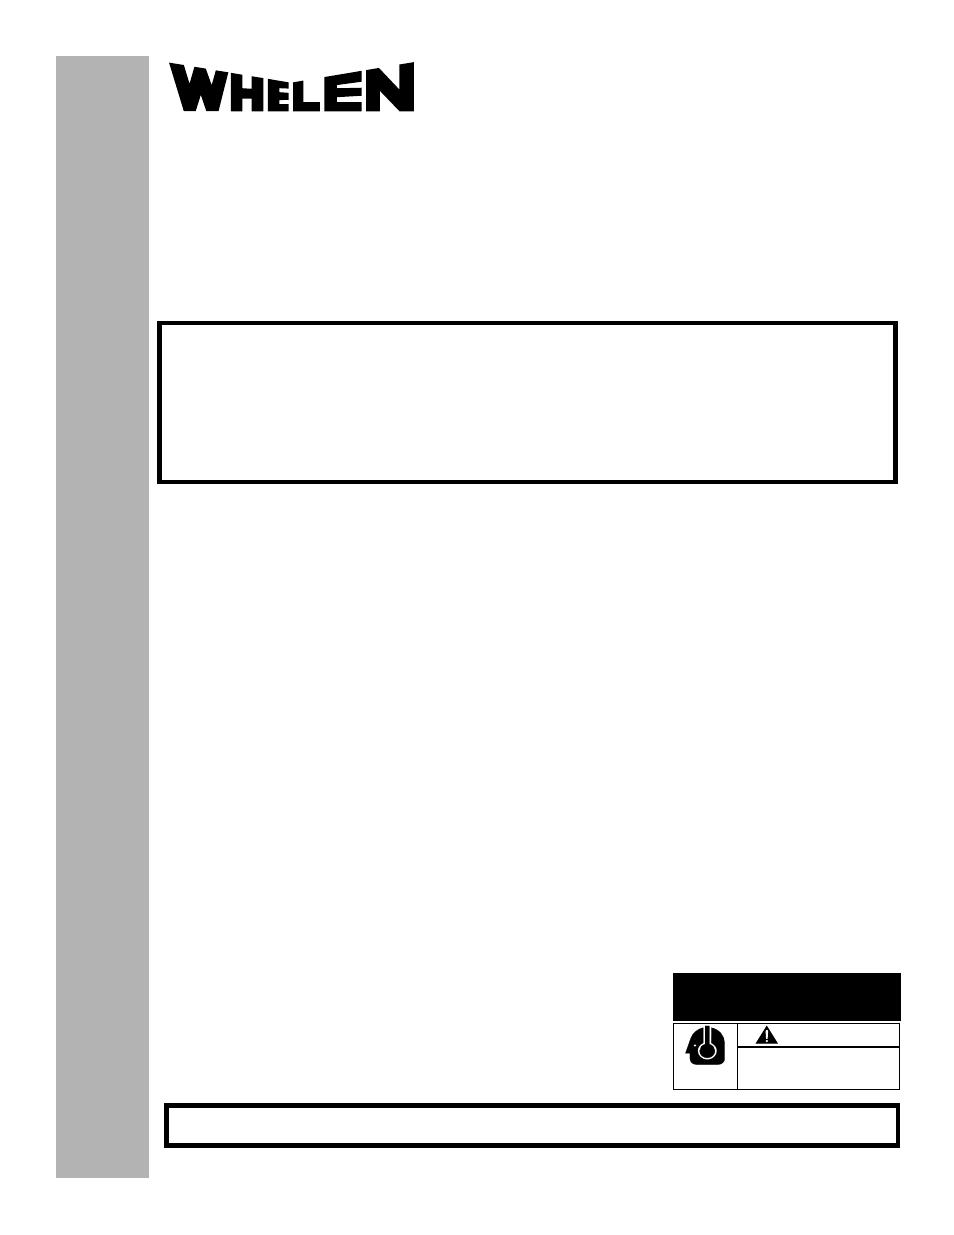 whelen beta124r user manual 6 pages whelen pcc10w whelen beta siren wiring #42